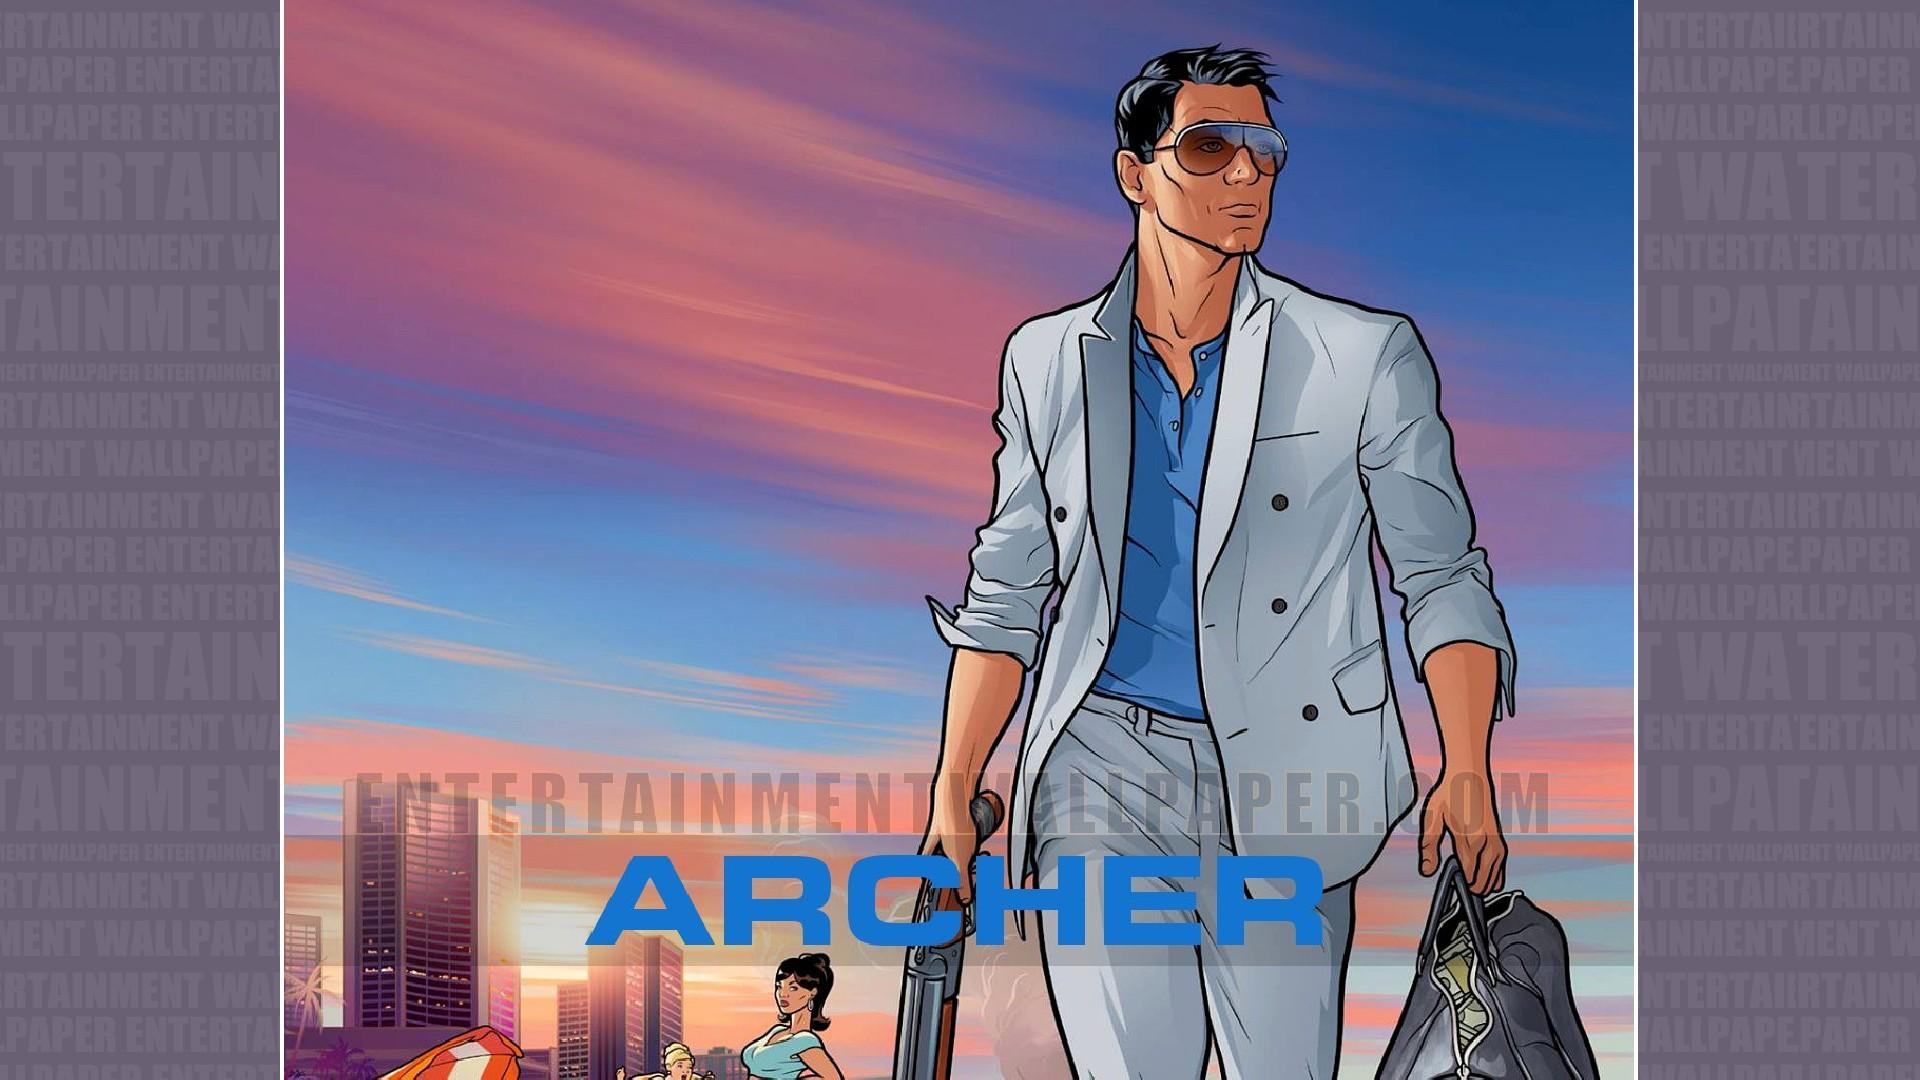 Archer TV Show Wallpaper - WallpaperSafari